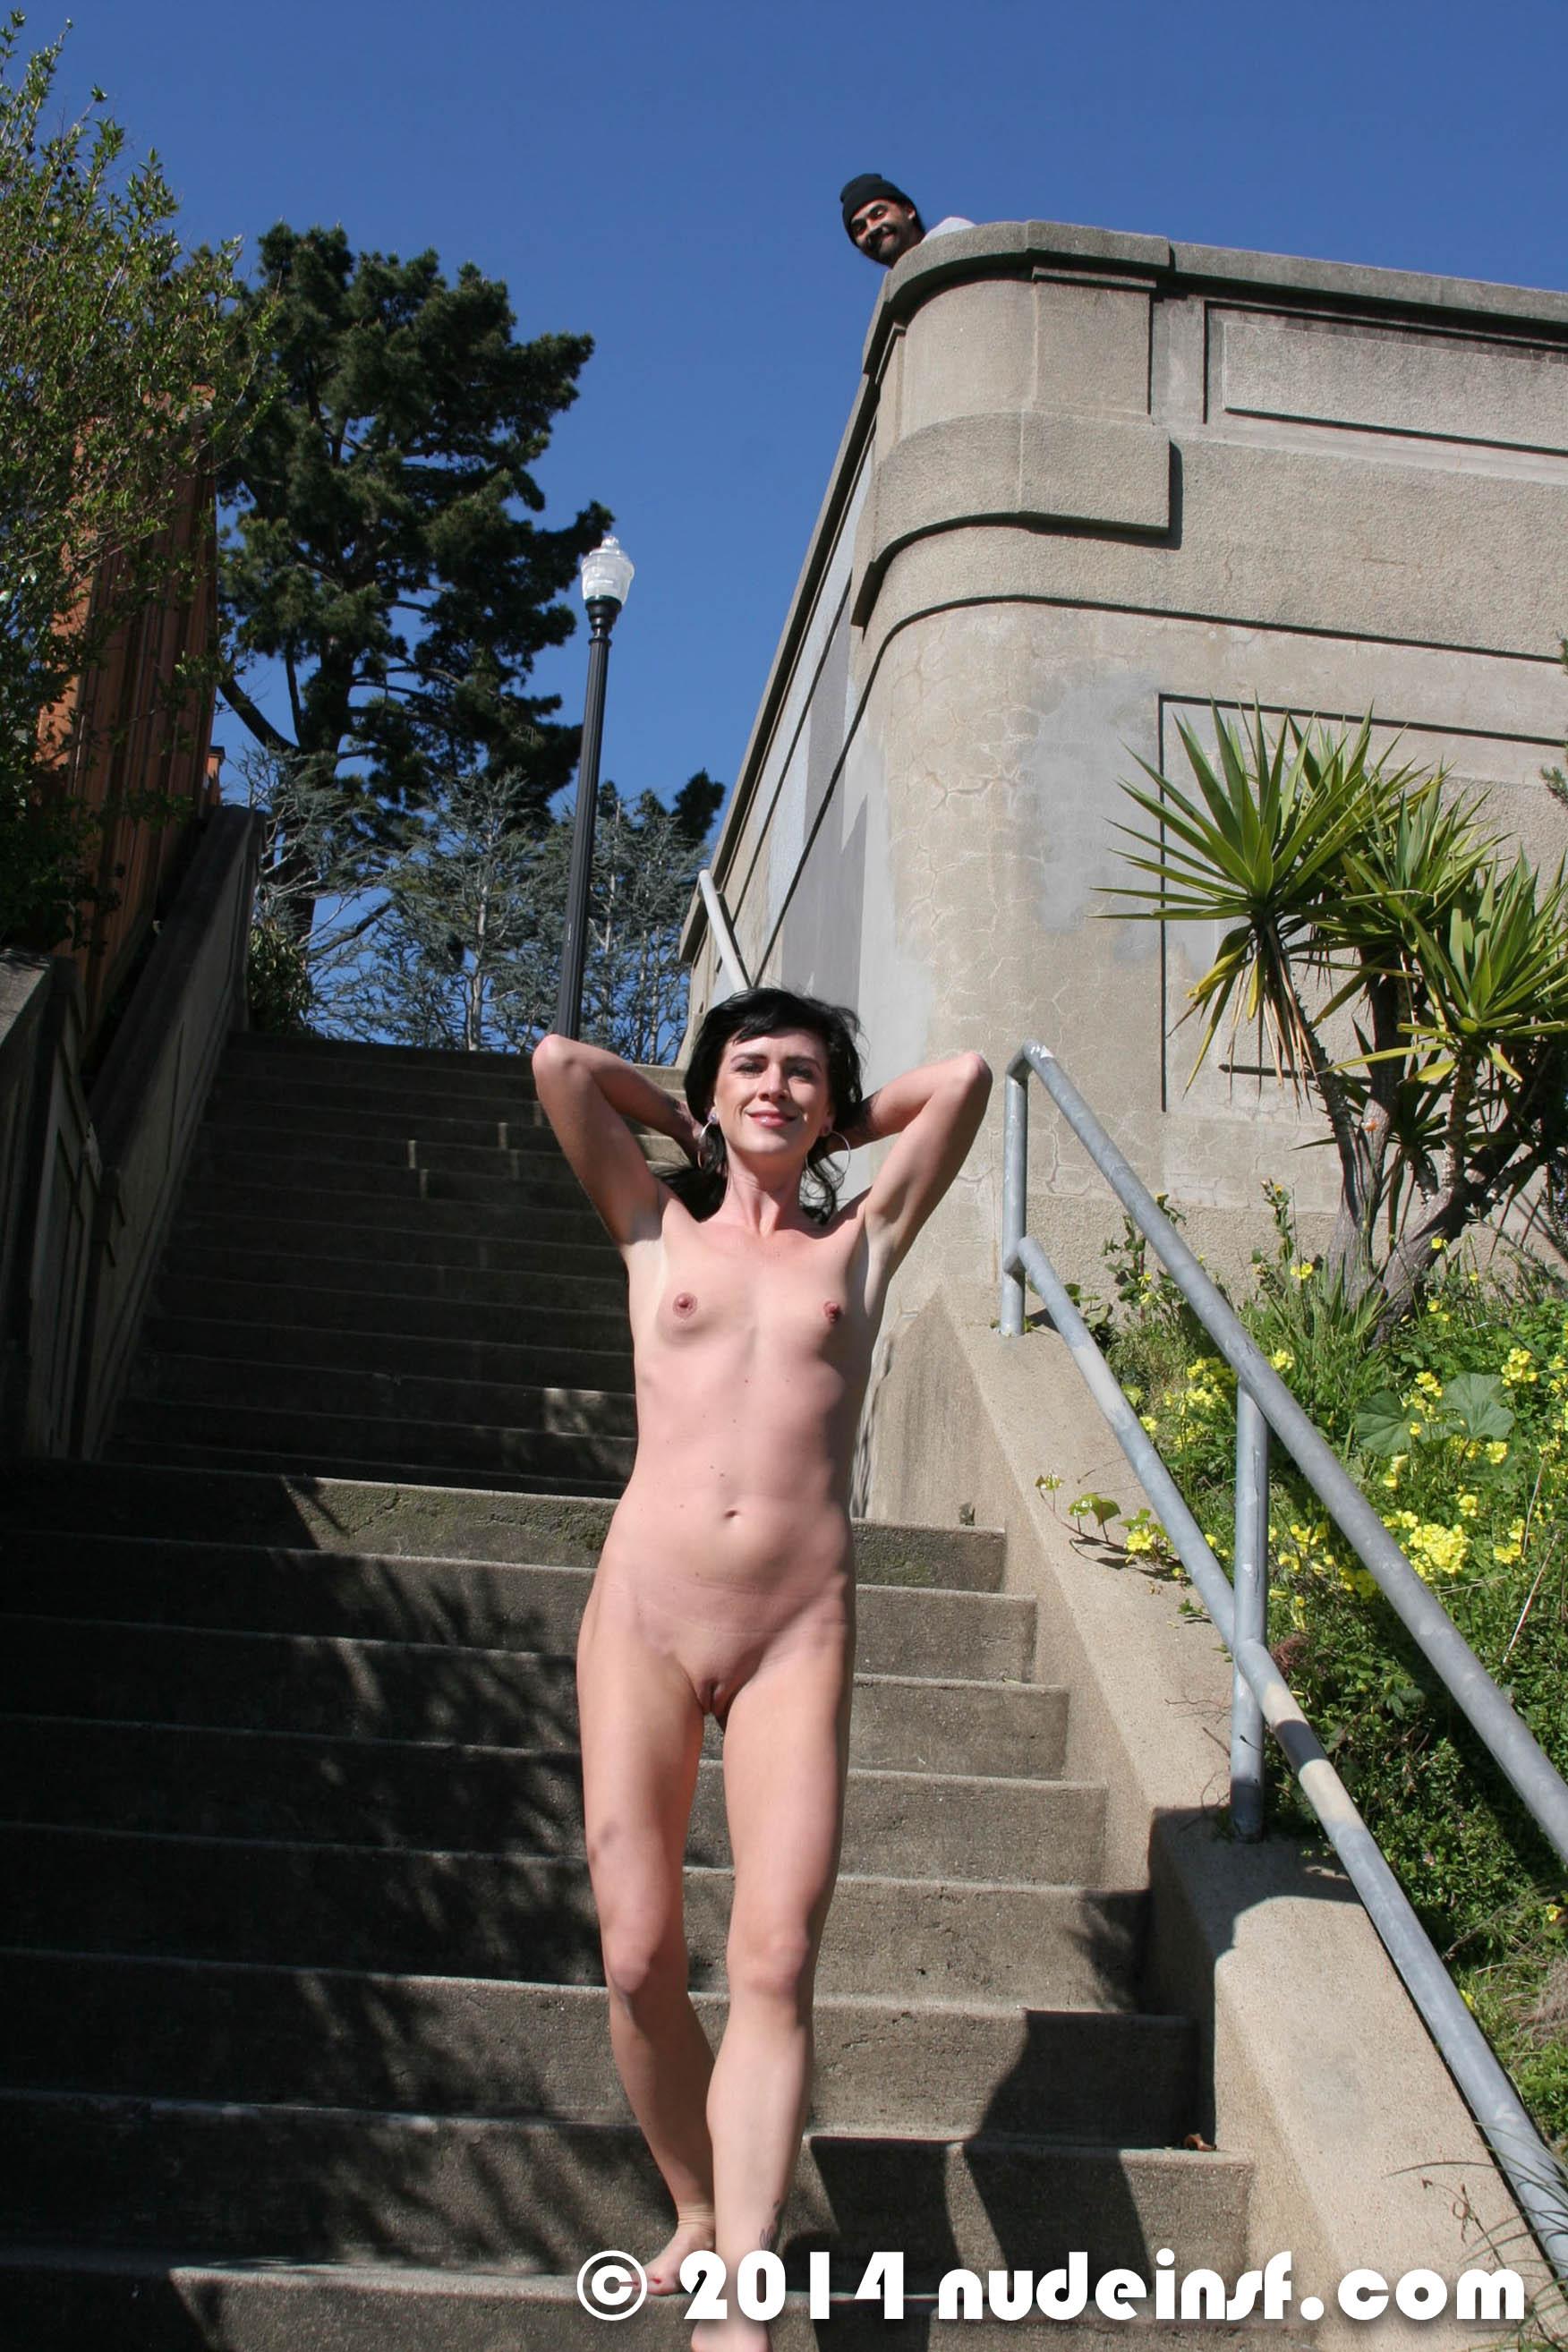 Gina - Public nudity in San Francisco California